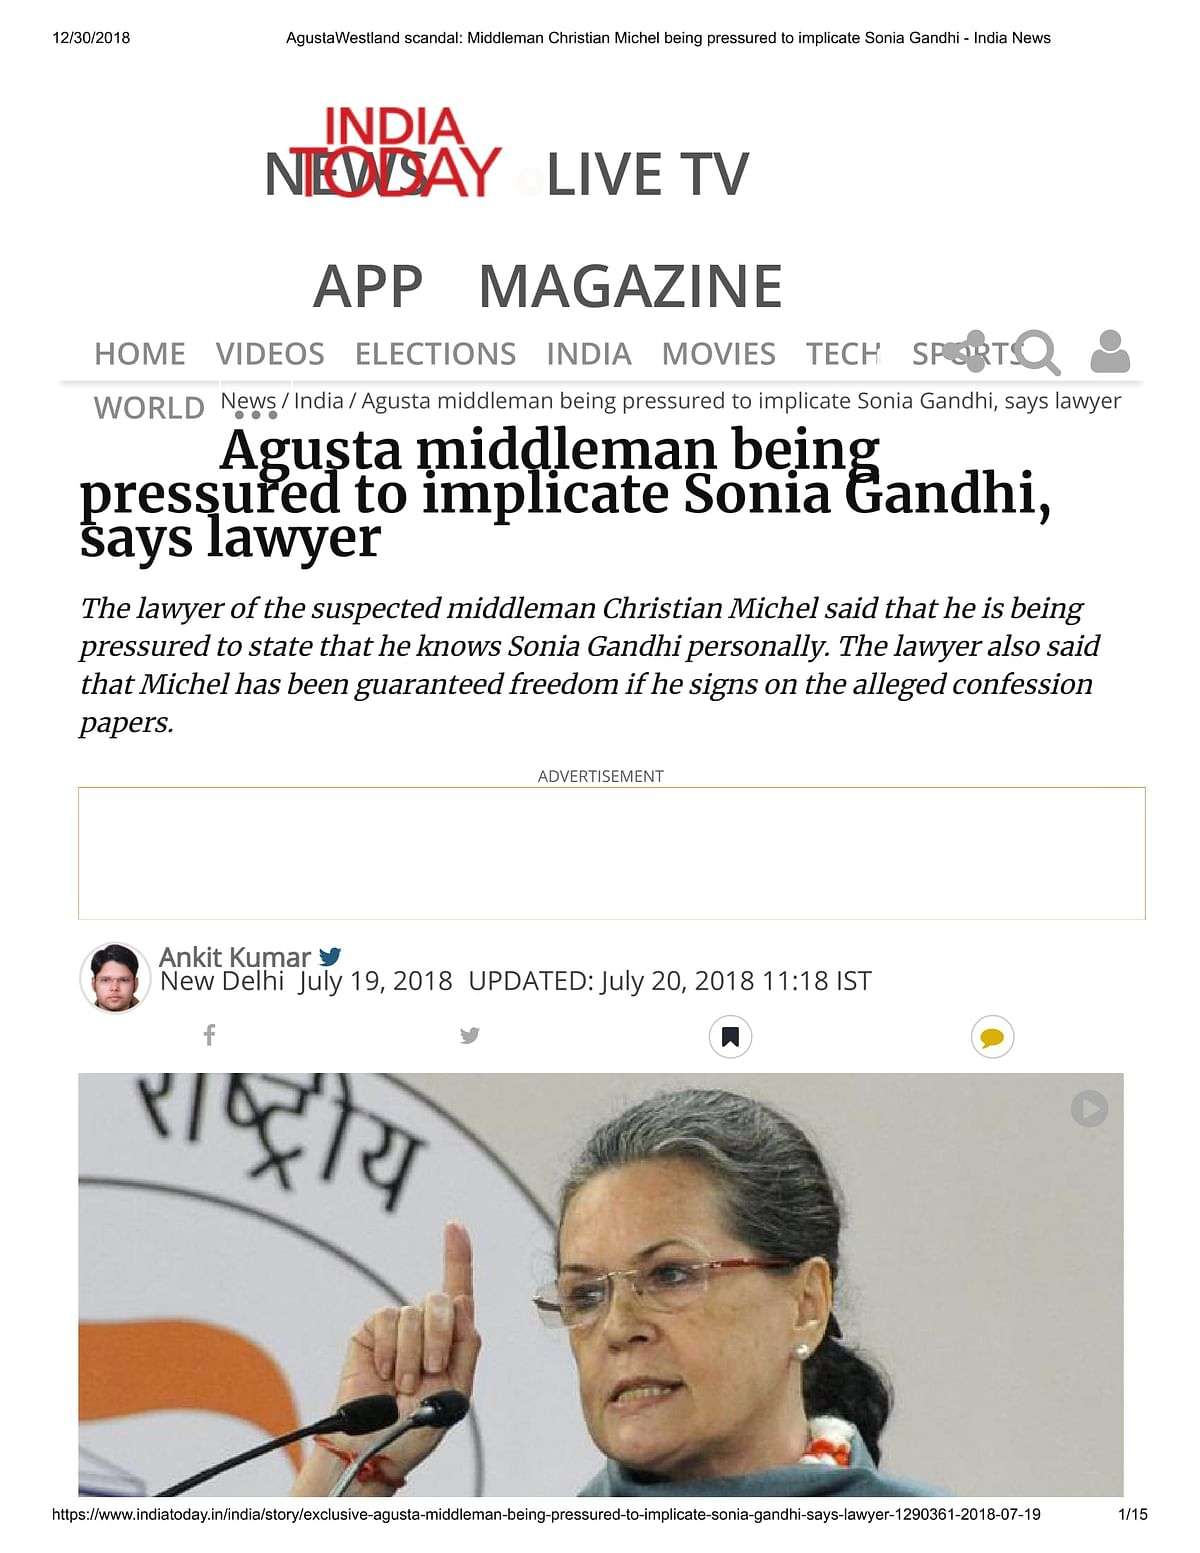 Augusta Westland: 6 questions to Modi & 'Embarrassing Directorate'